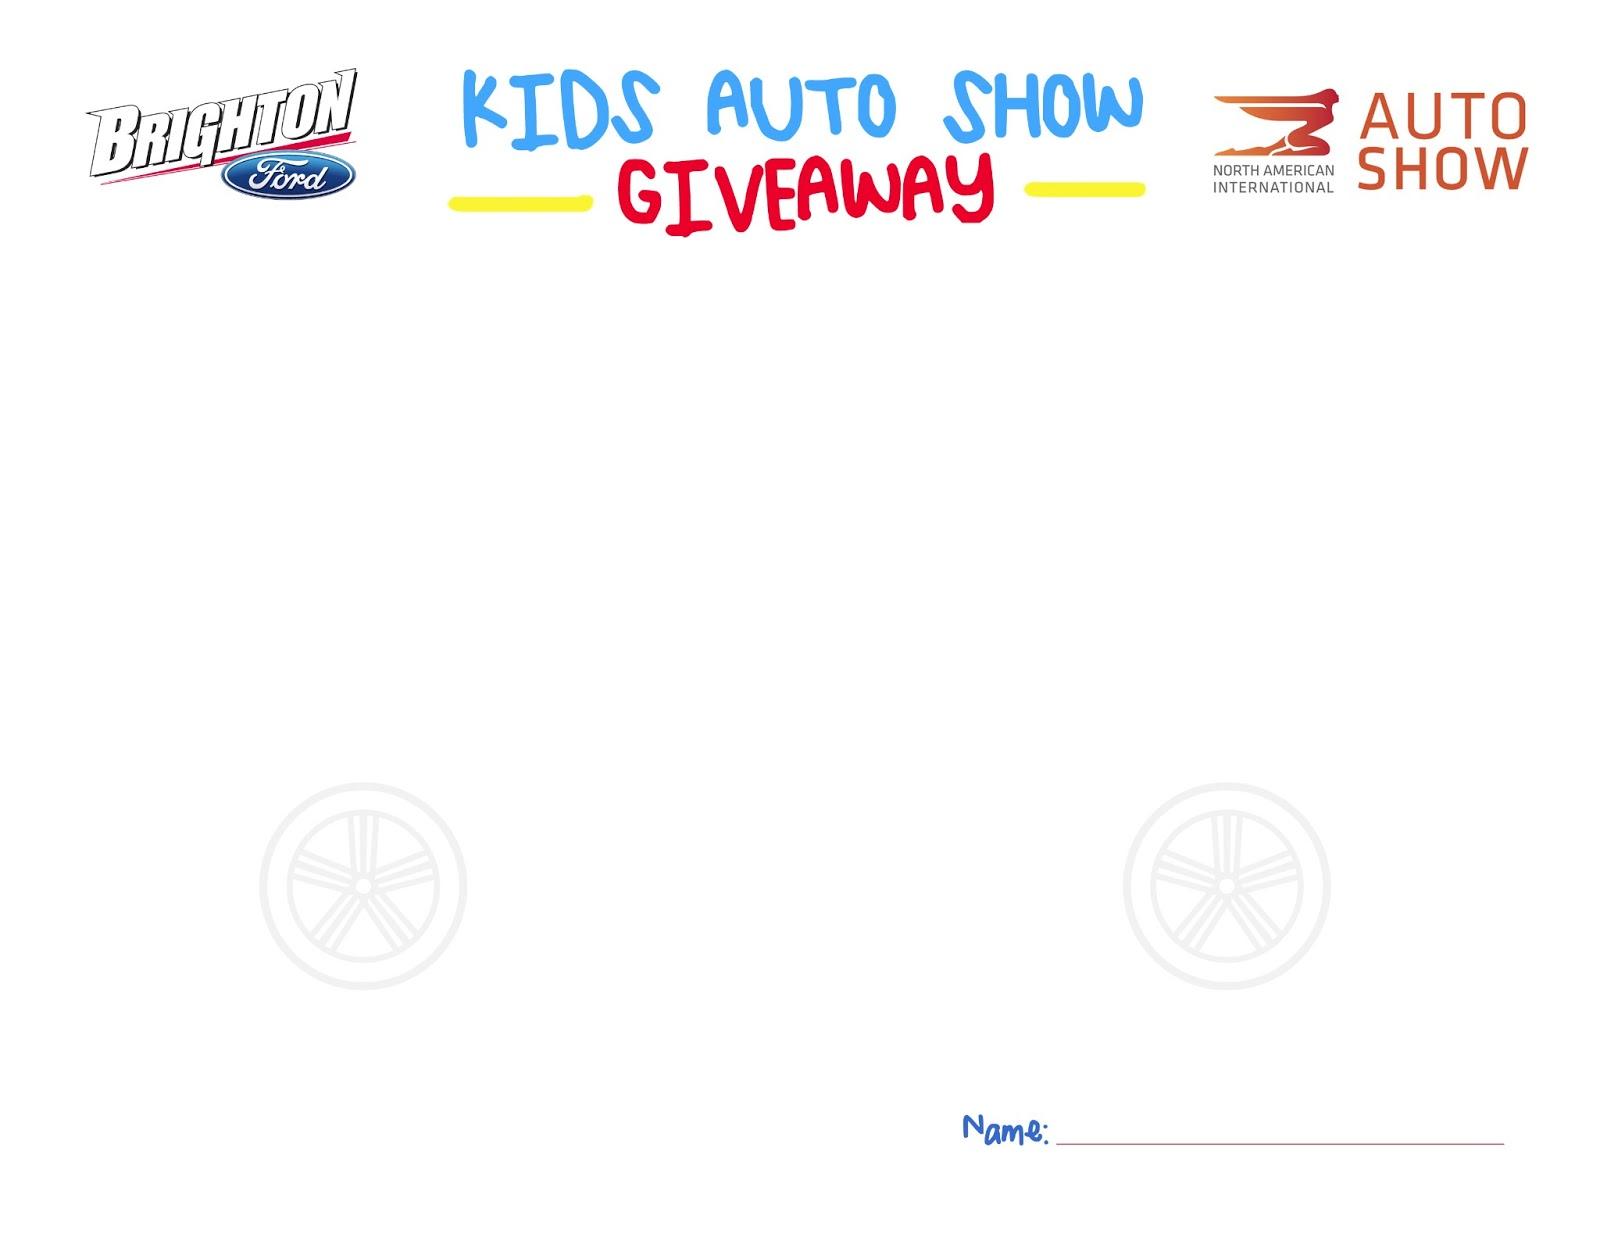 Detroit Auto Show Ticket Giveaway